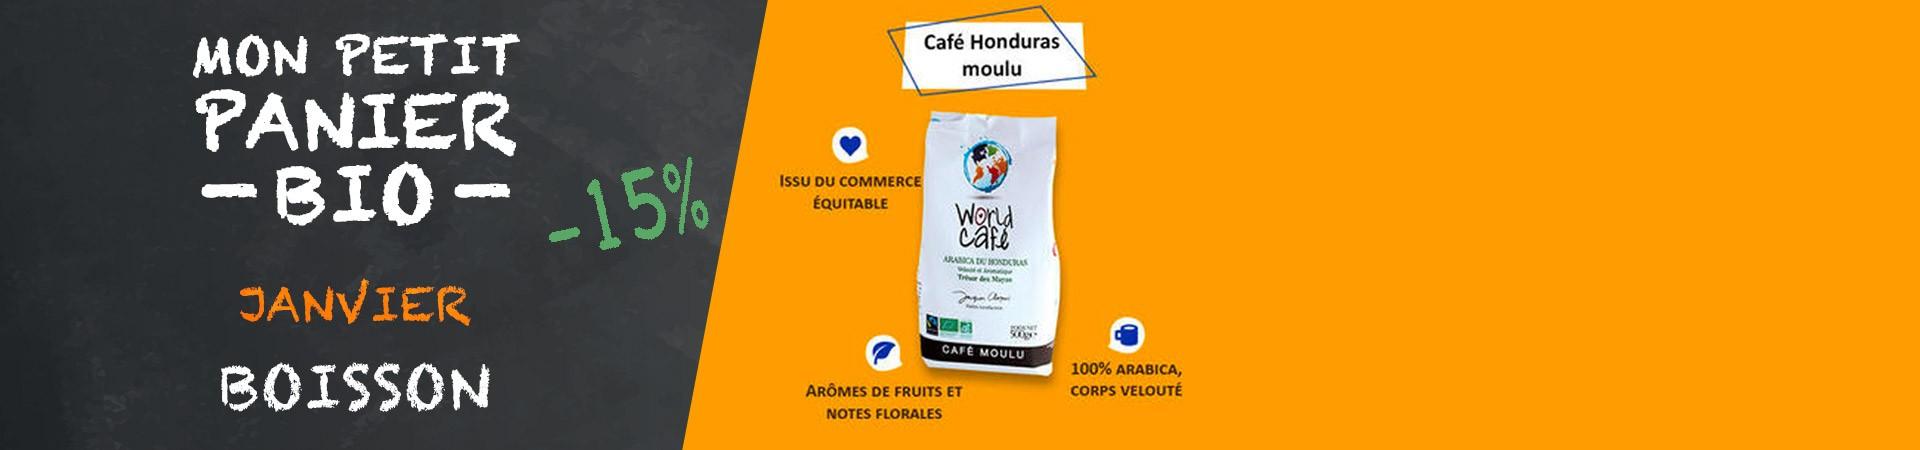 Café Honduras moulu